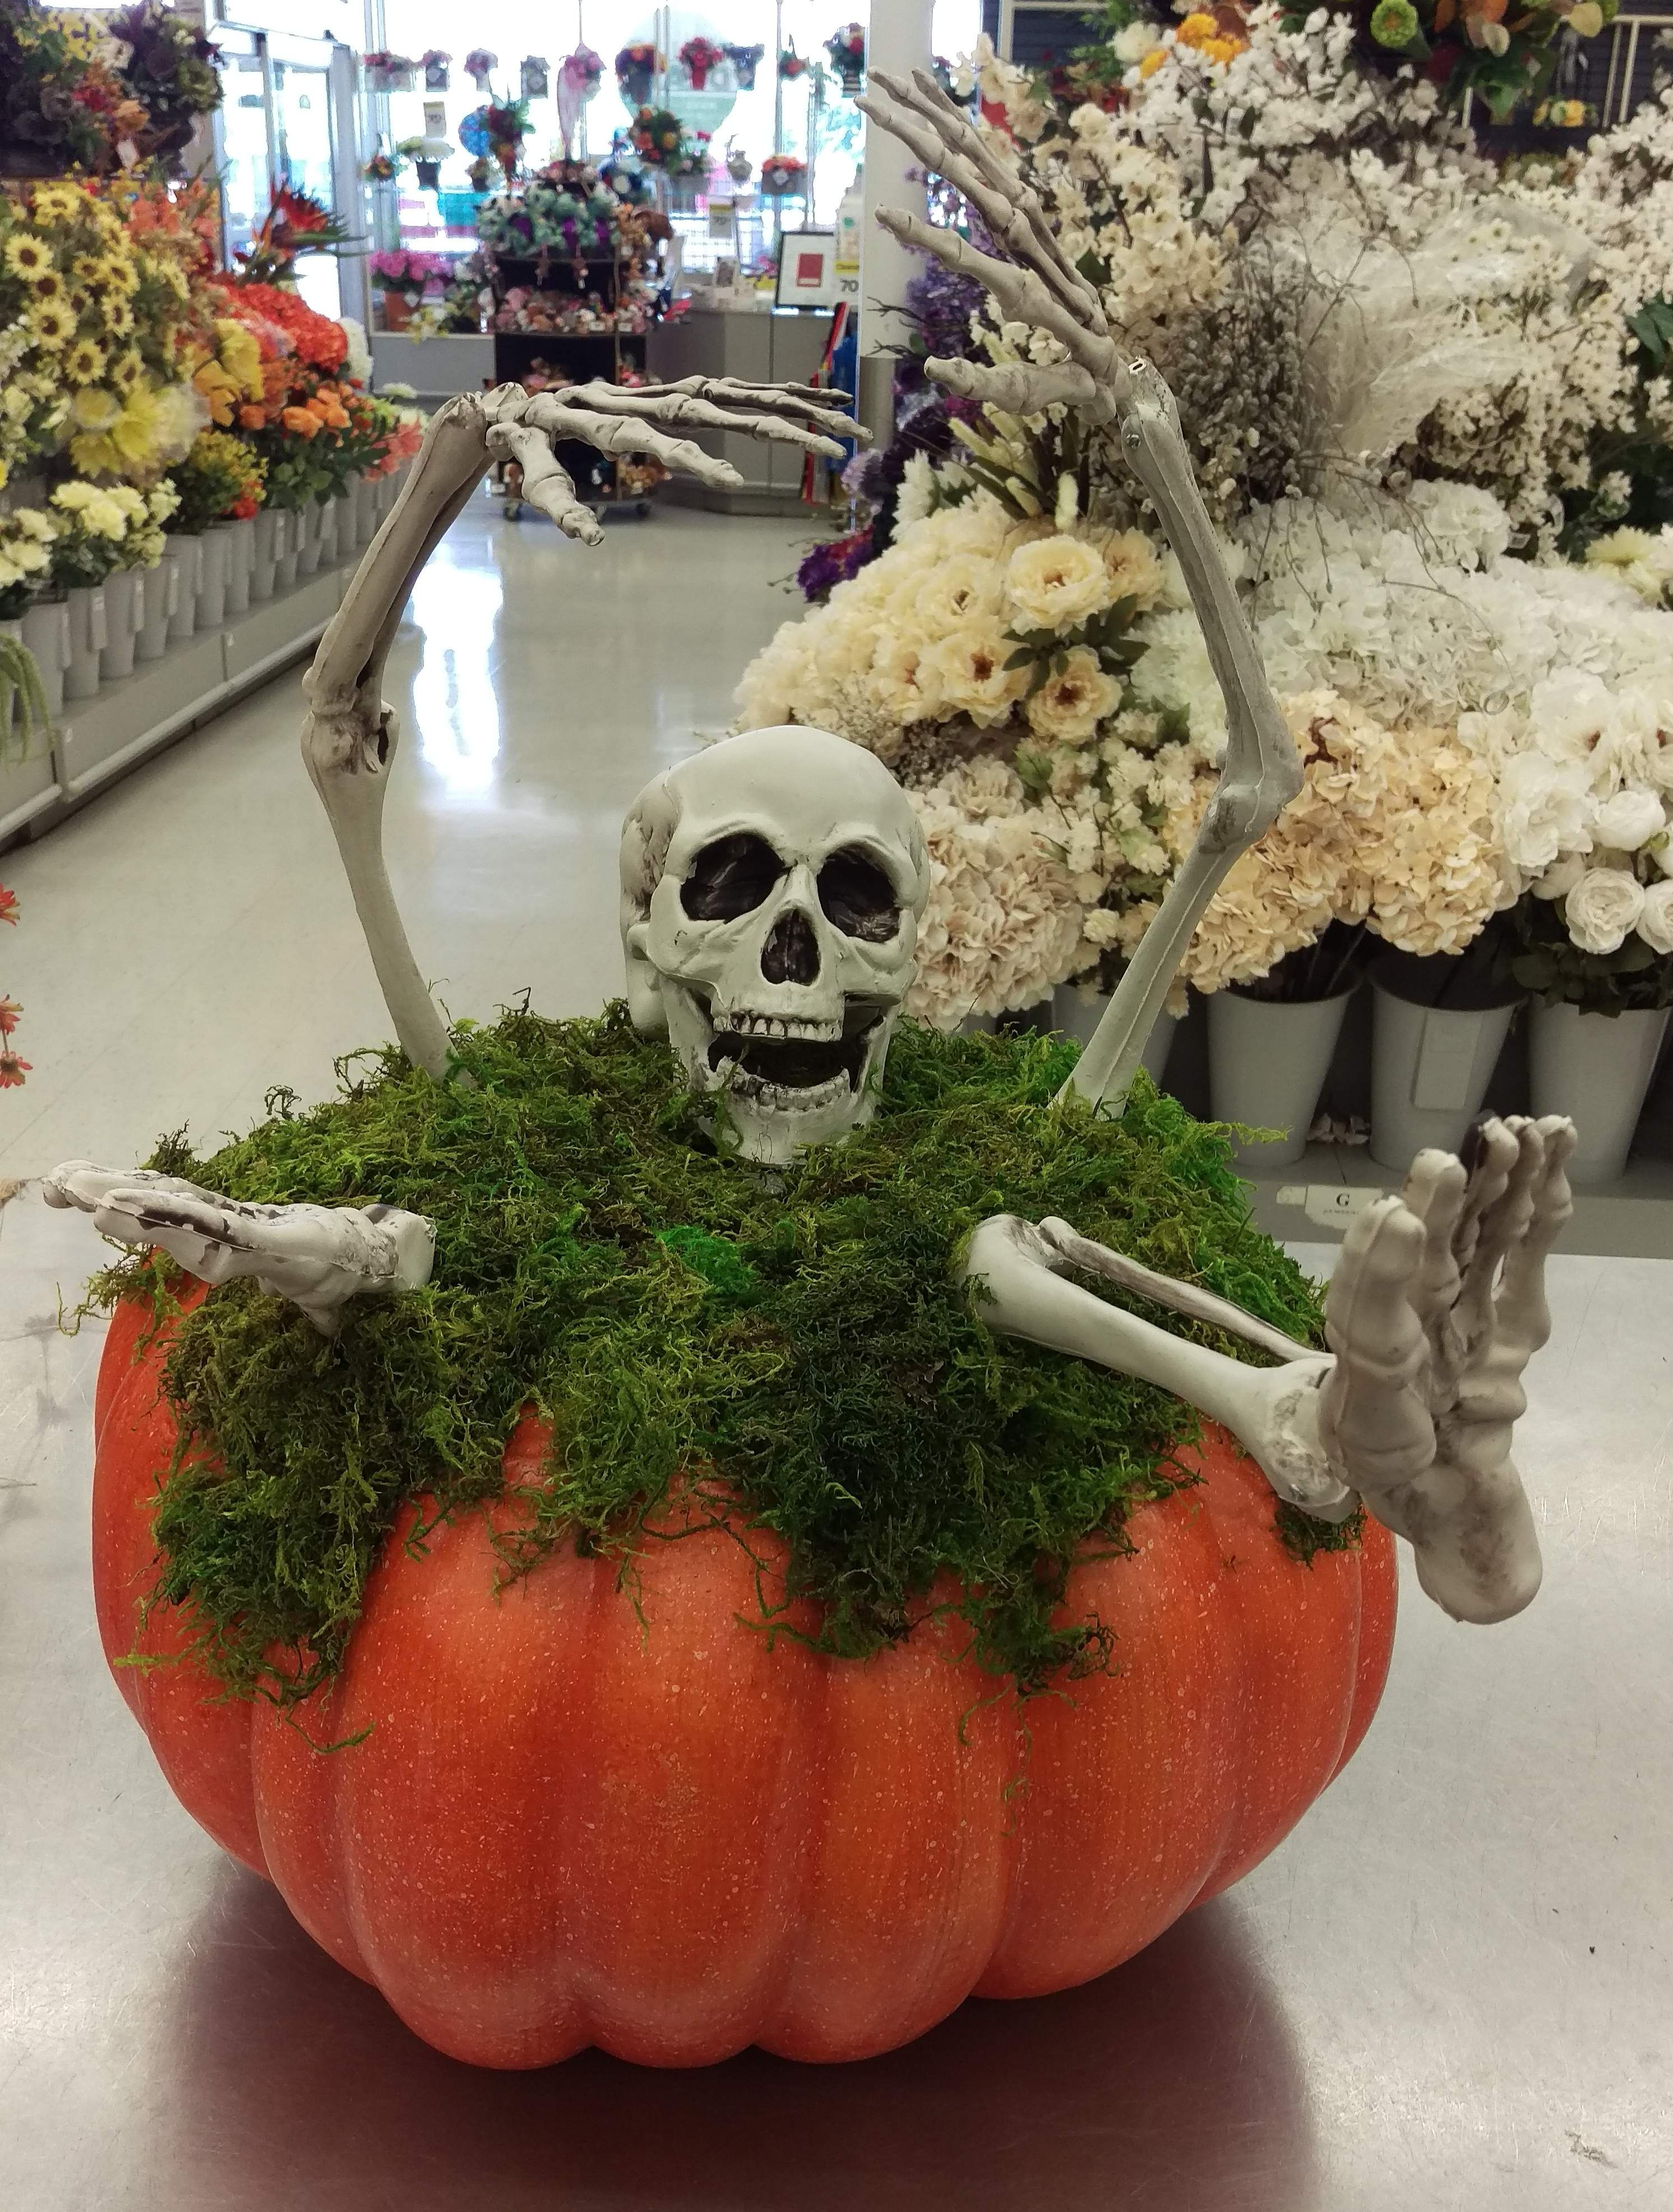 Fall 2017 by Randi Sheldon at Michaels 1600 Halloween decor - cool halloween decoration ideas